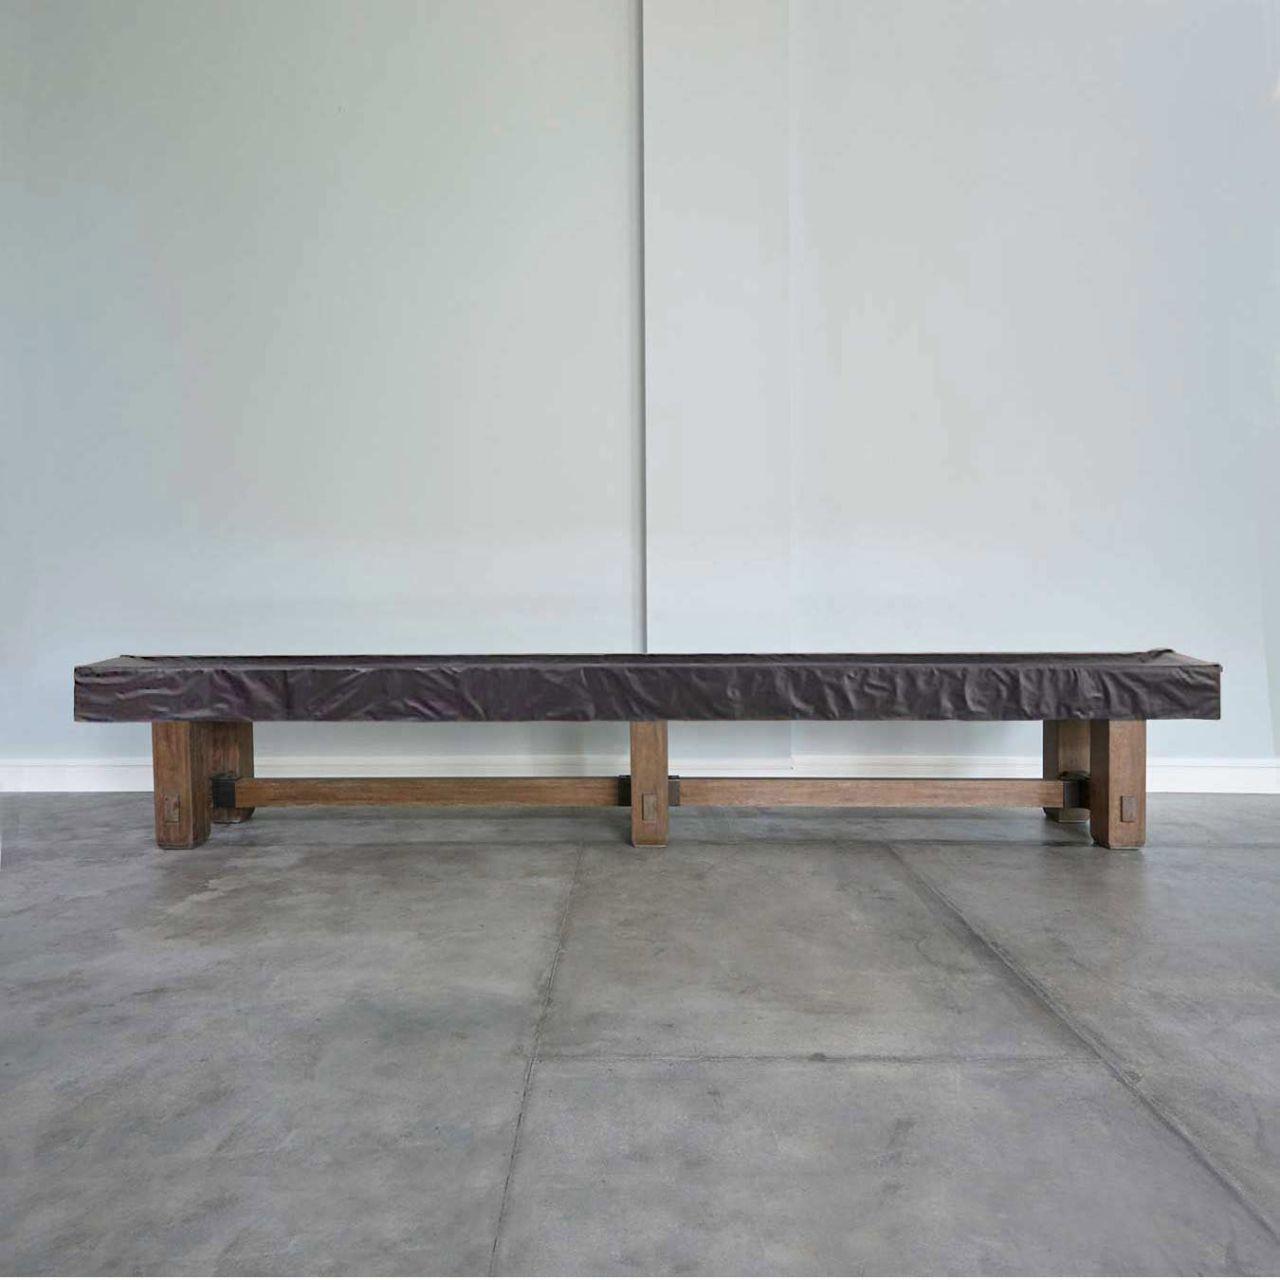 Gebhardts & Brunswick Shuffleboard Table Cover